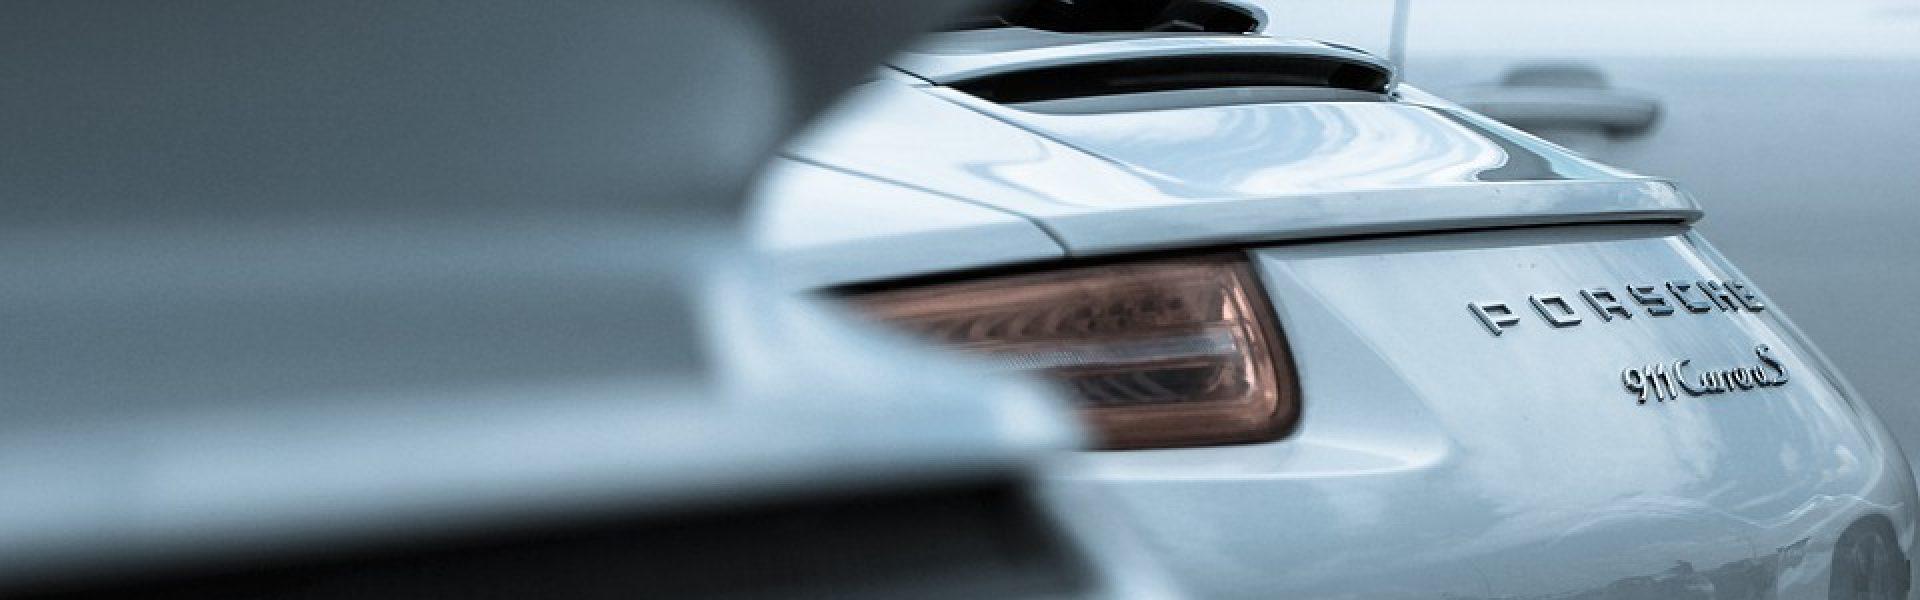 TIP Porsche